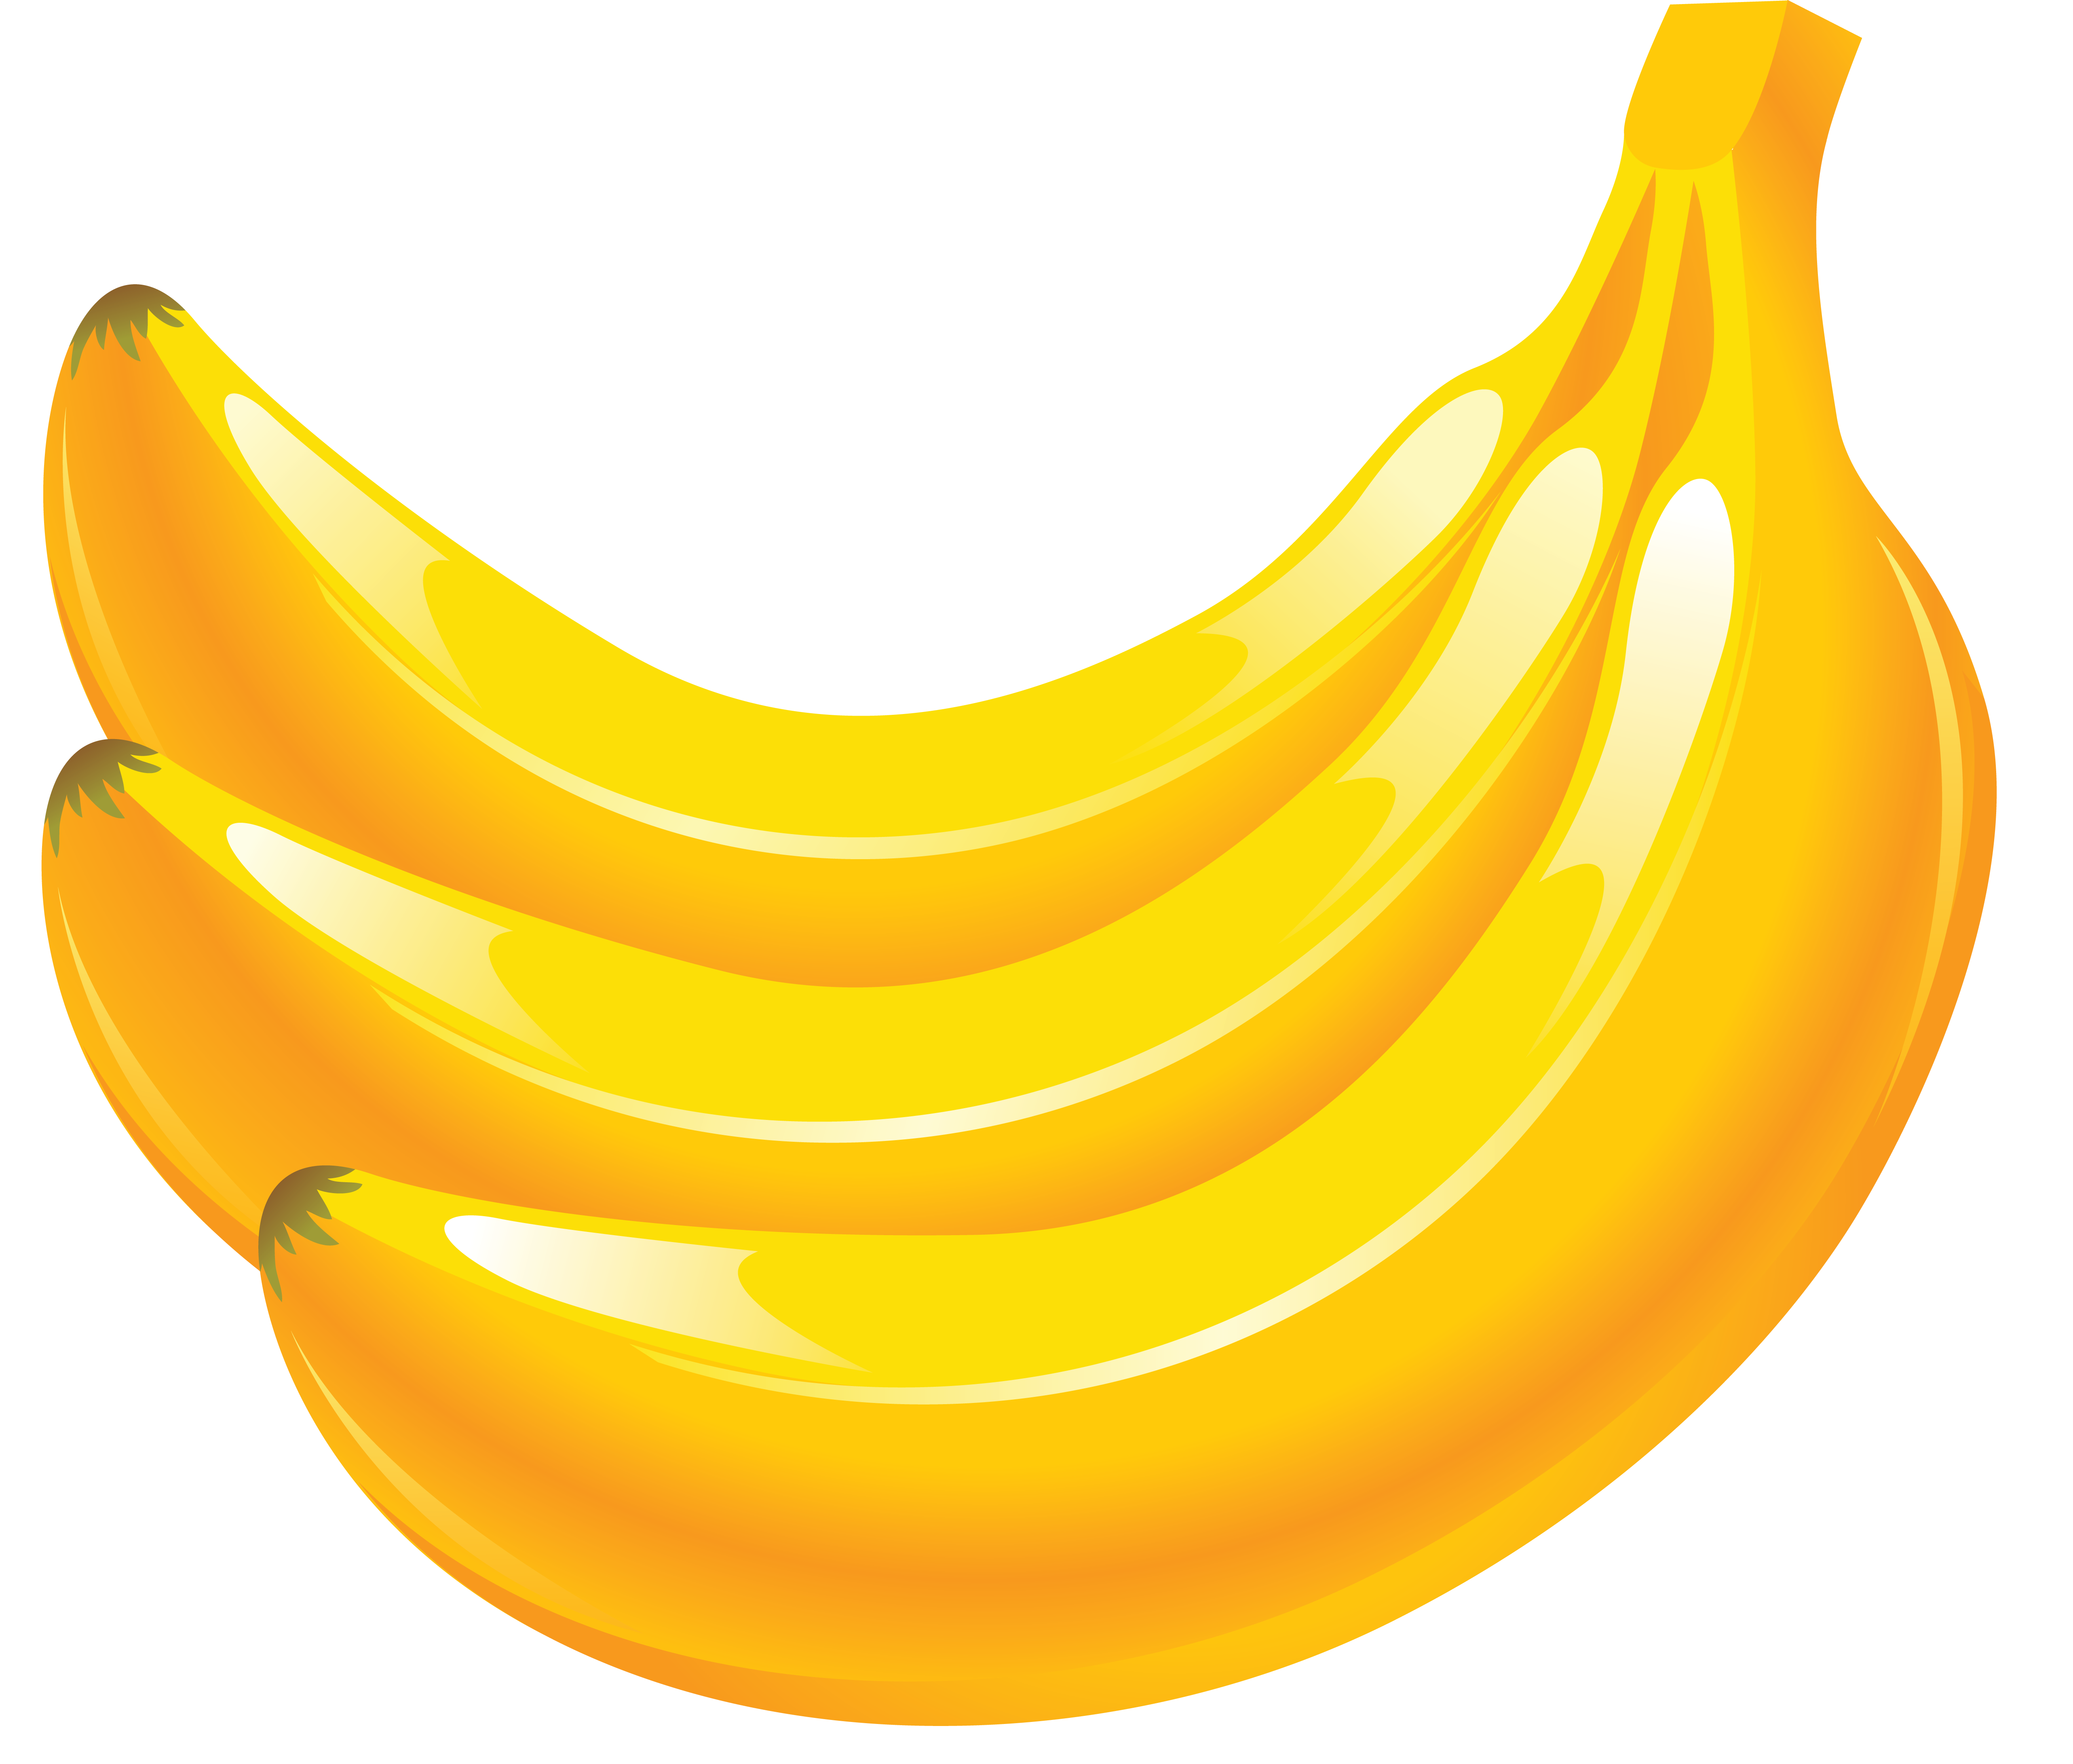 Bananas clipart banana fruit. Pin by hopeless on